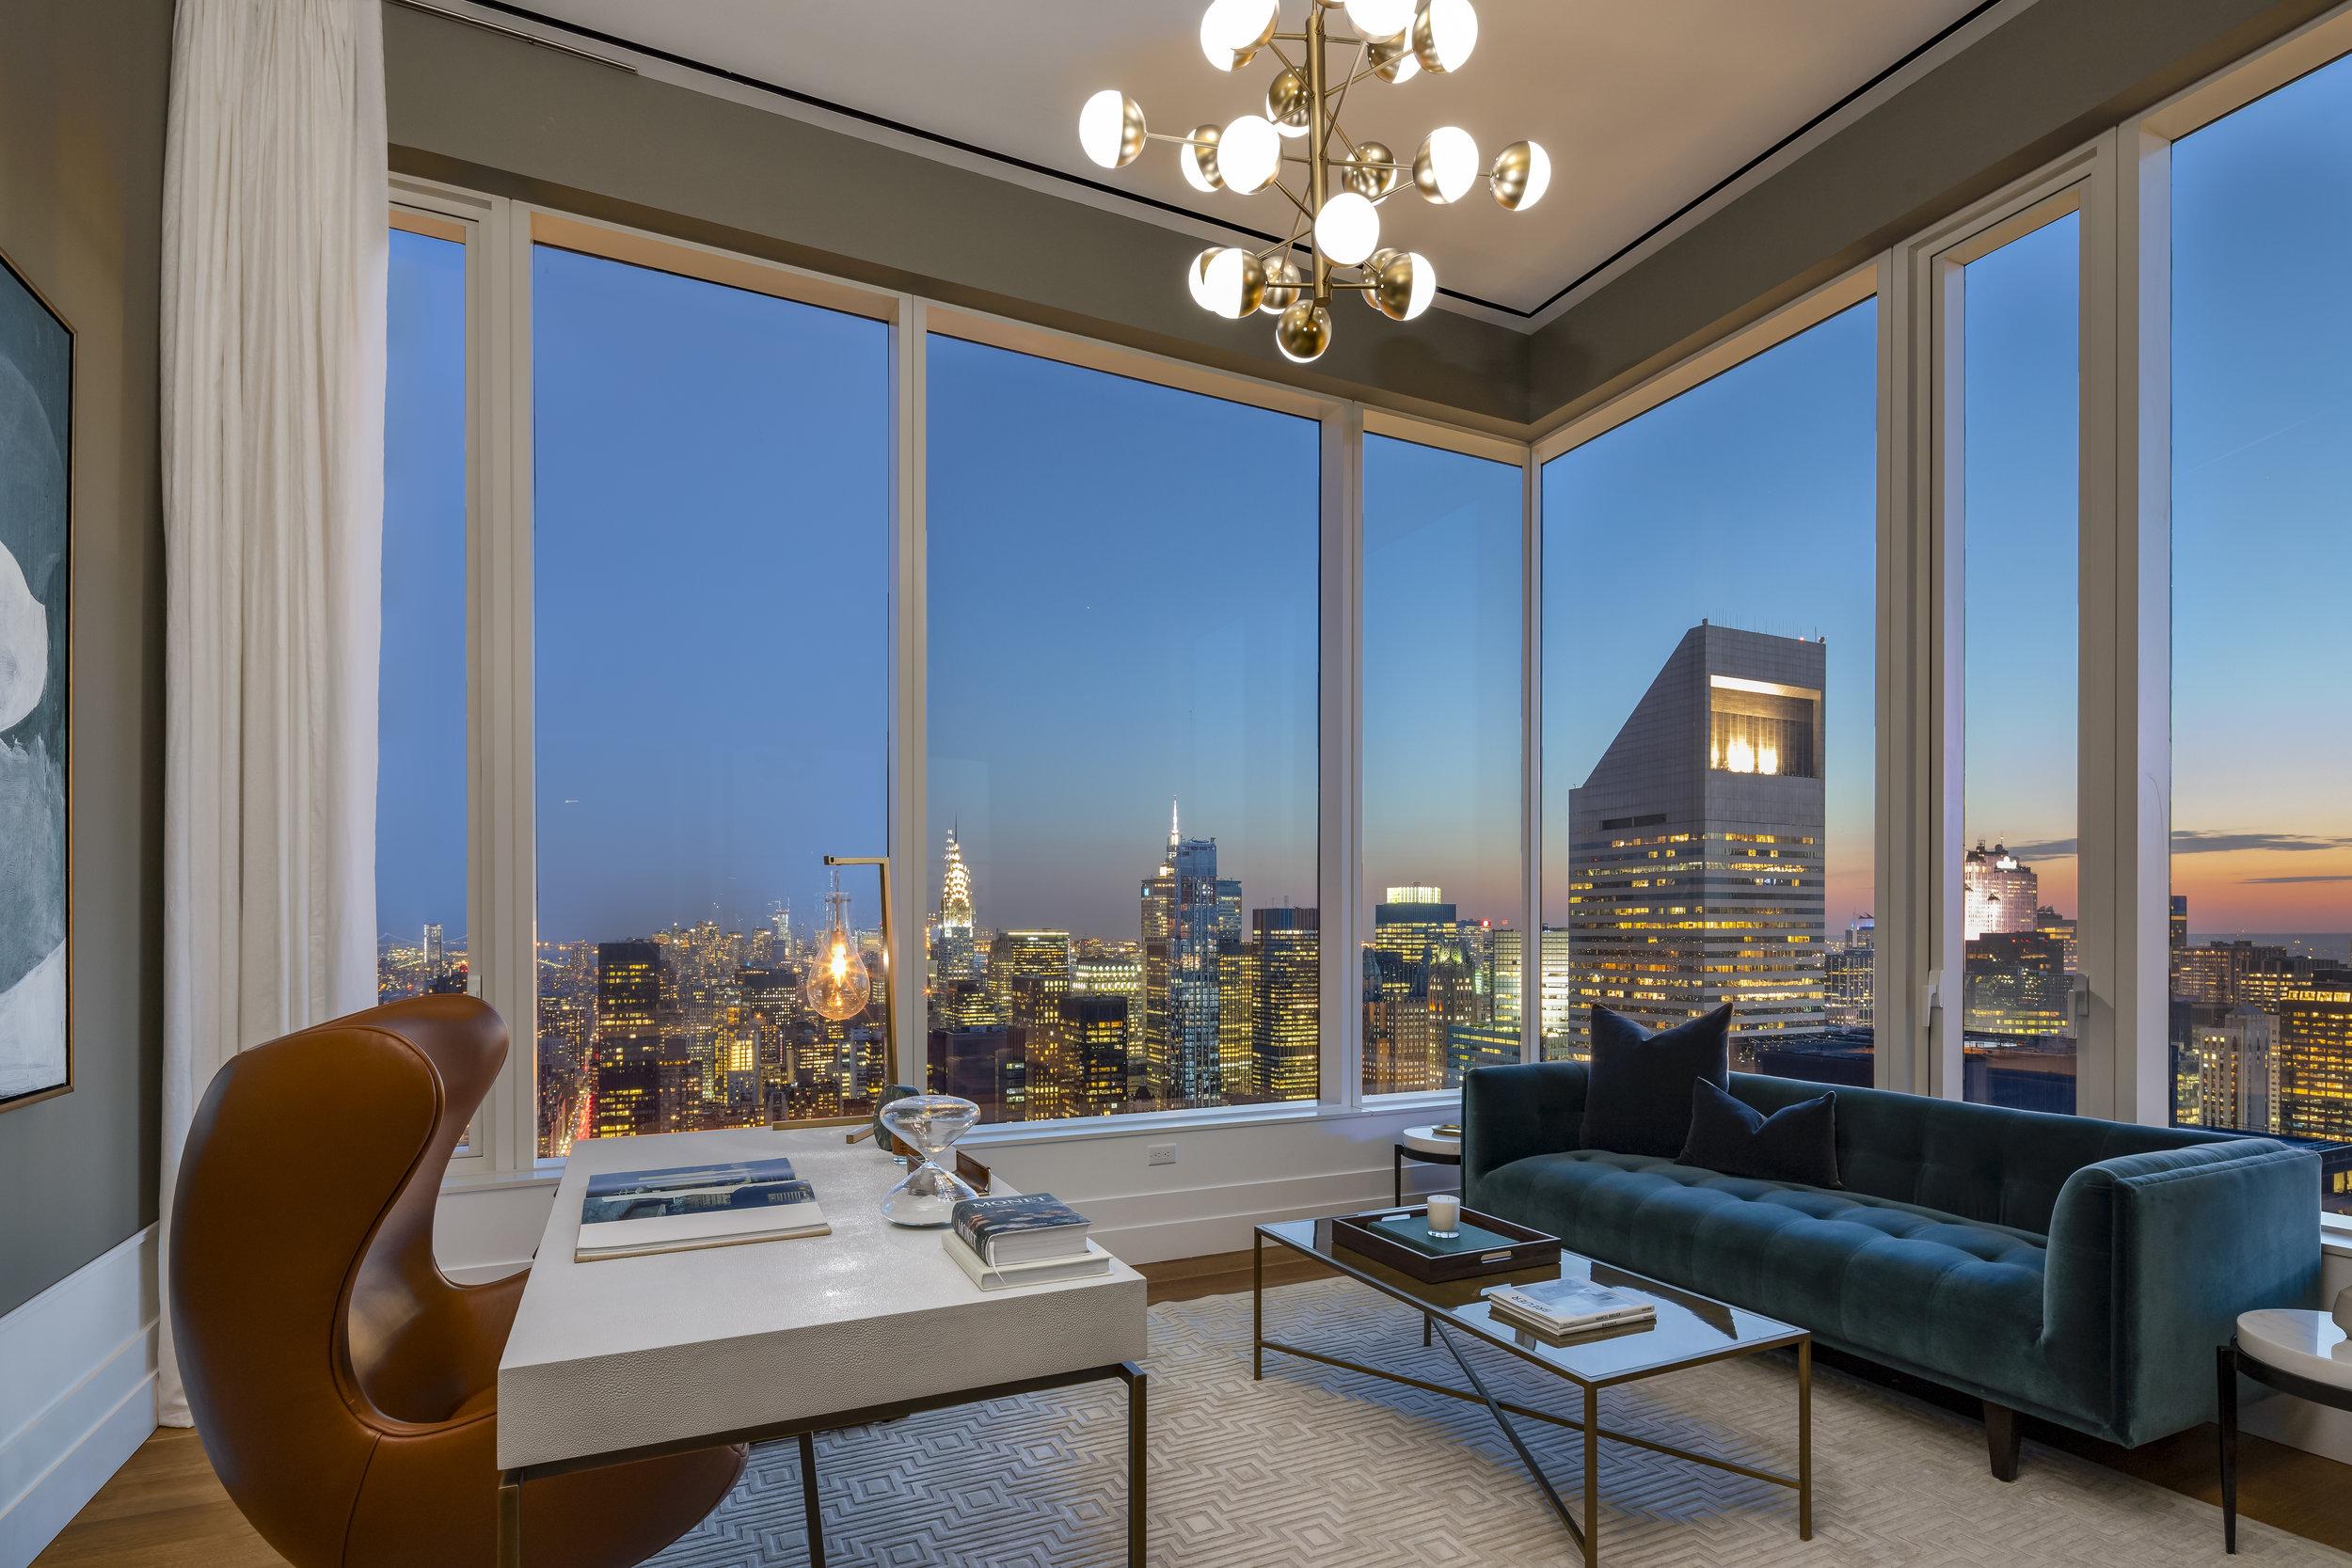 Peek Inside the Penthouse At Billionaire Row's 252 East 57th Street Asking $29.75 Million